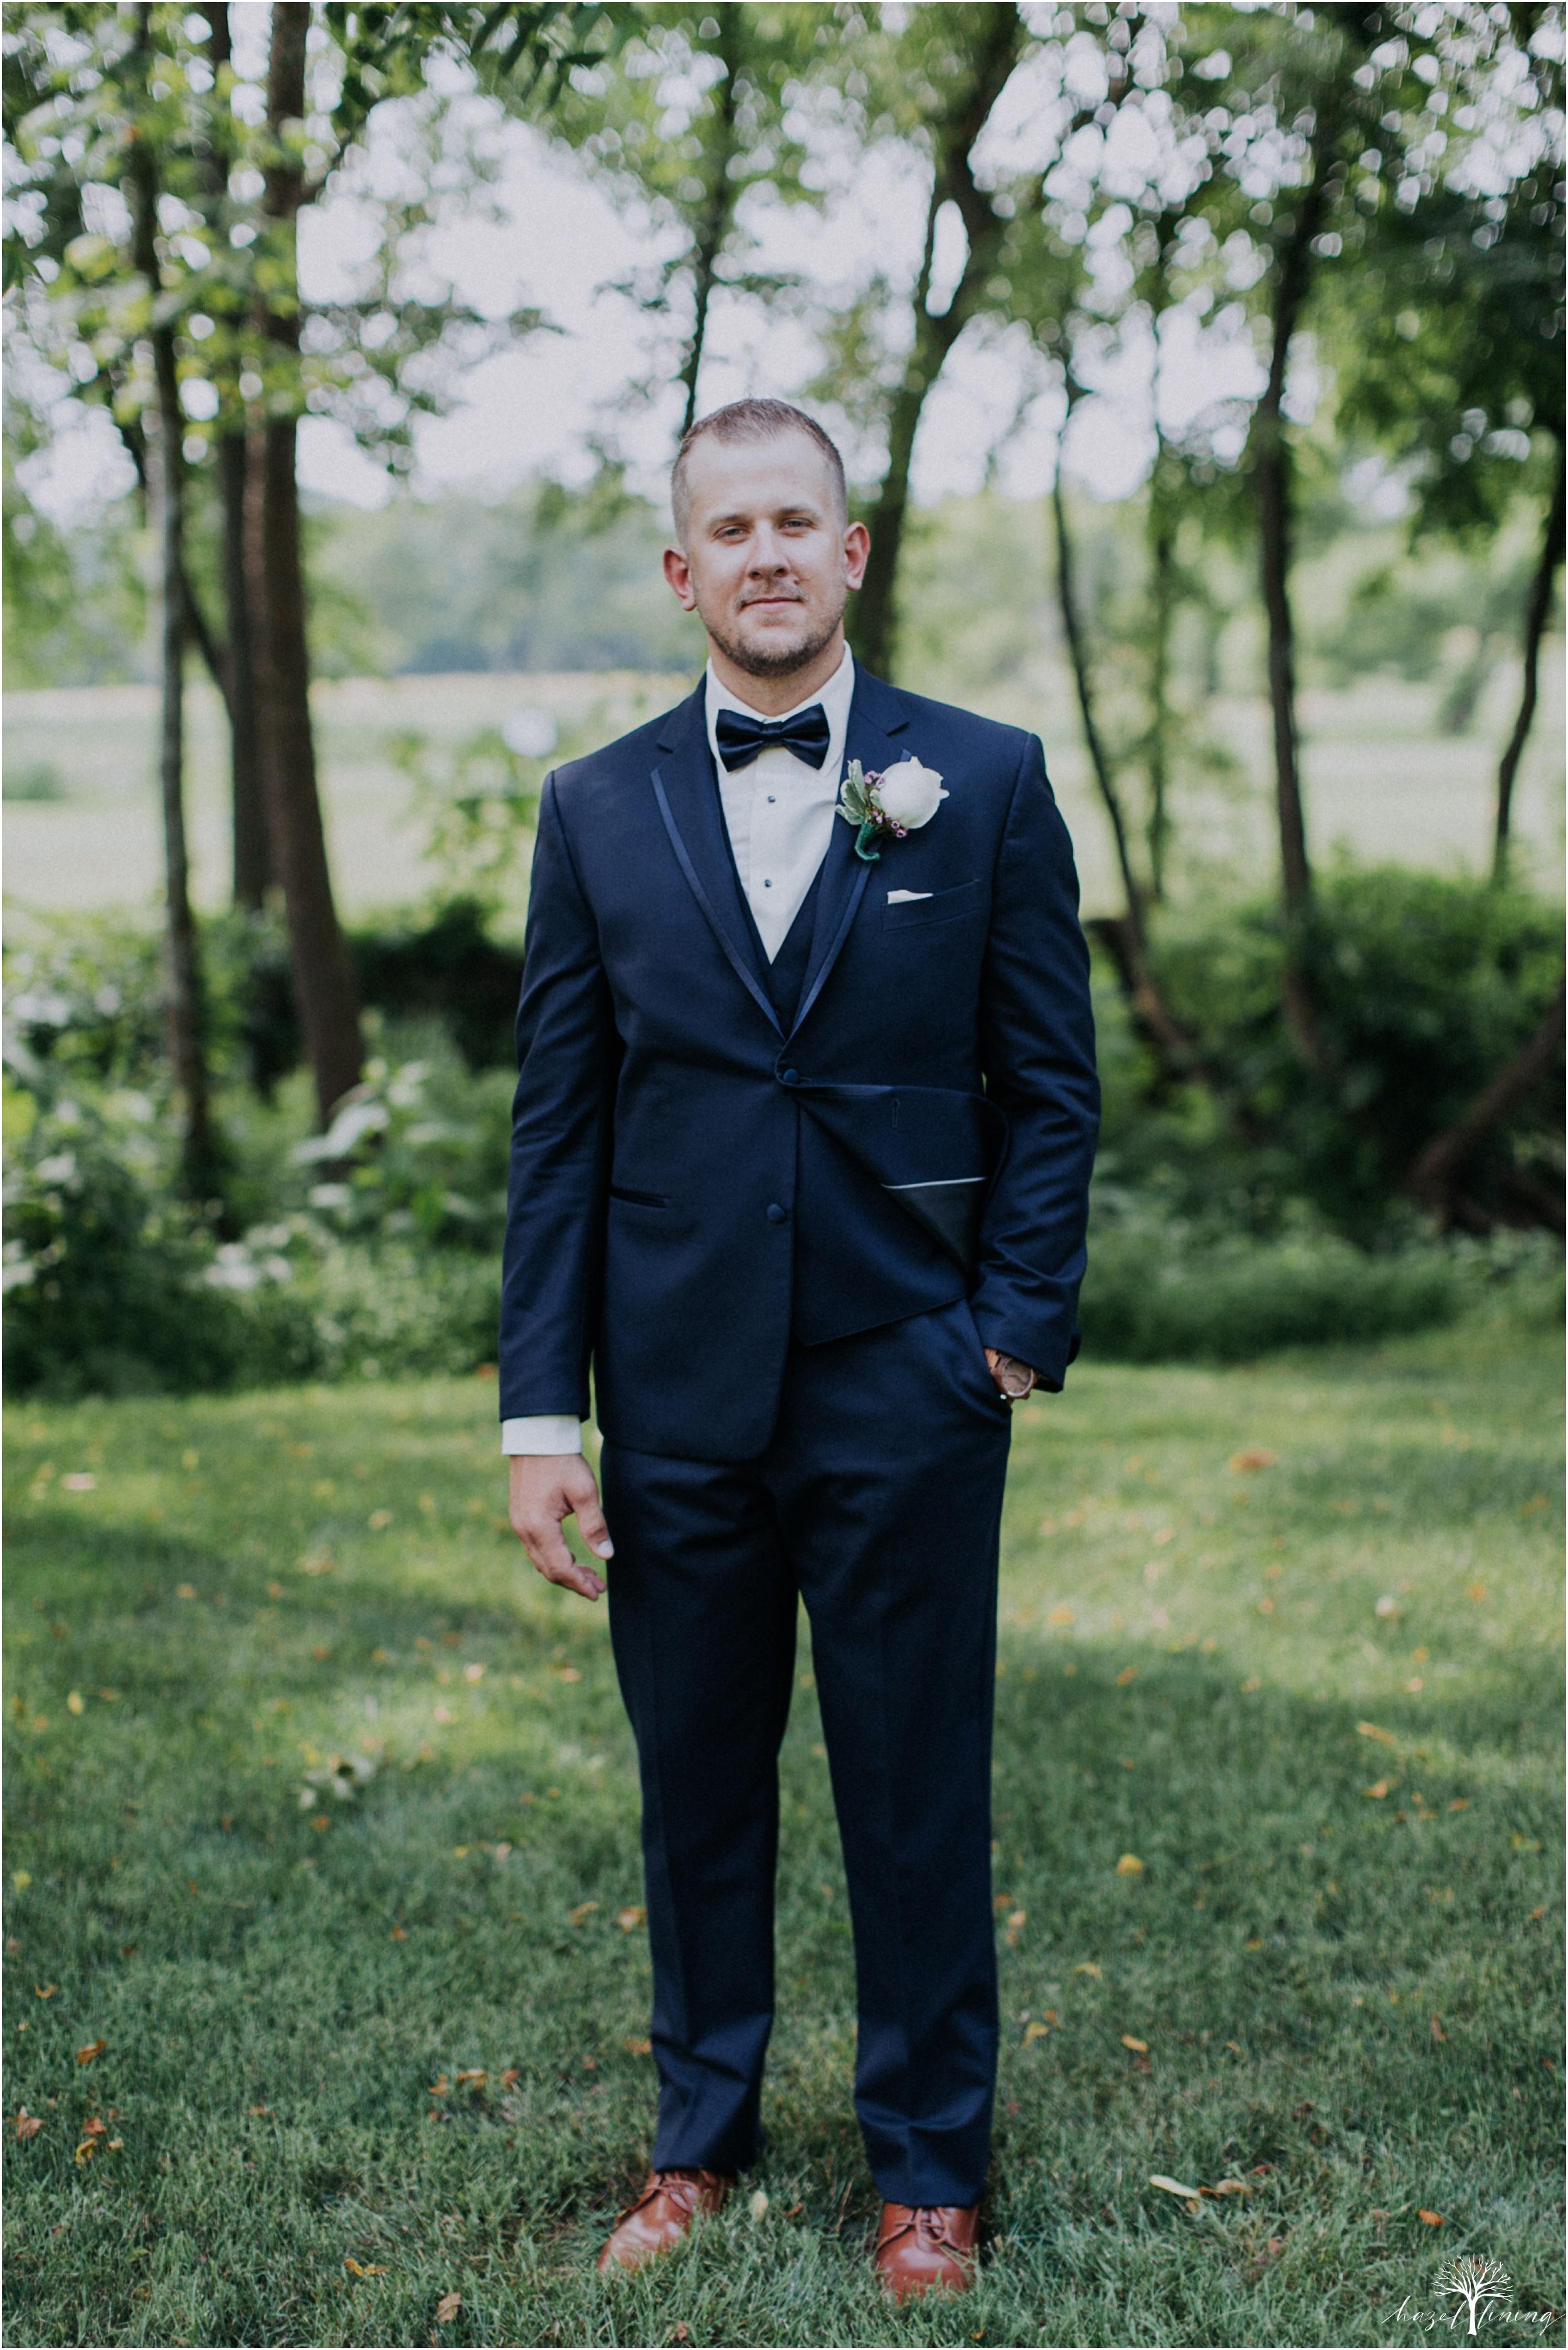 alyssa-james-stiteler-wedding-loft-and-sweet-water-cc-pennsburg-pennsylvania-hazel-lining-travel-wedding-elopement-photography_0102.jpg